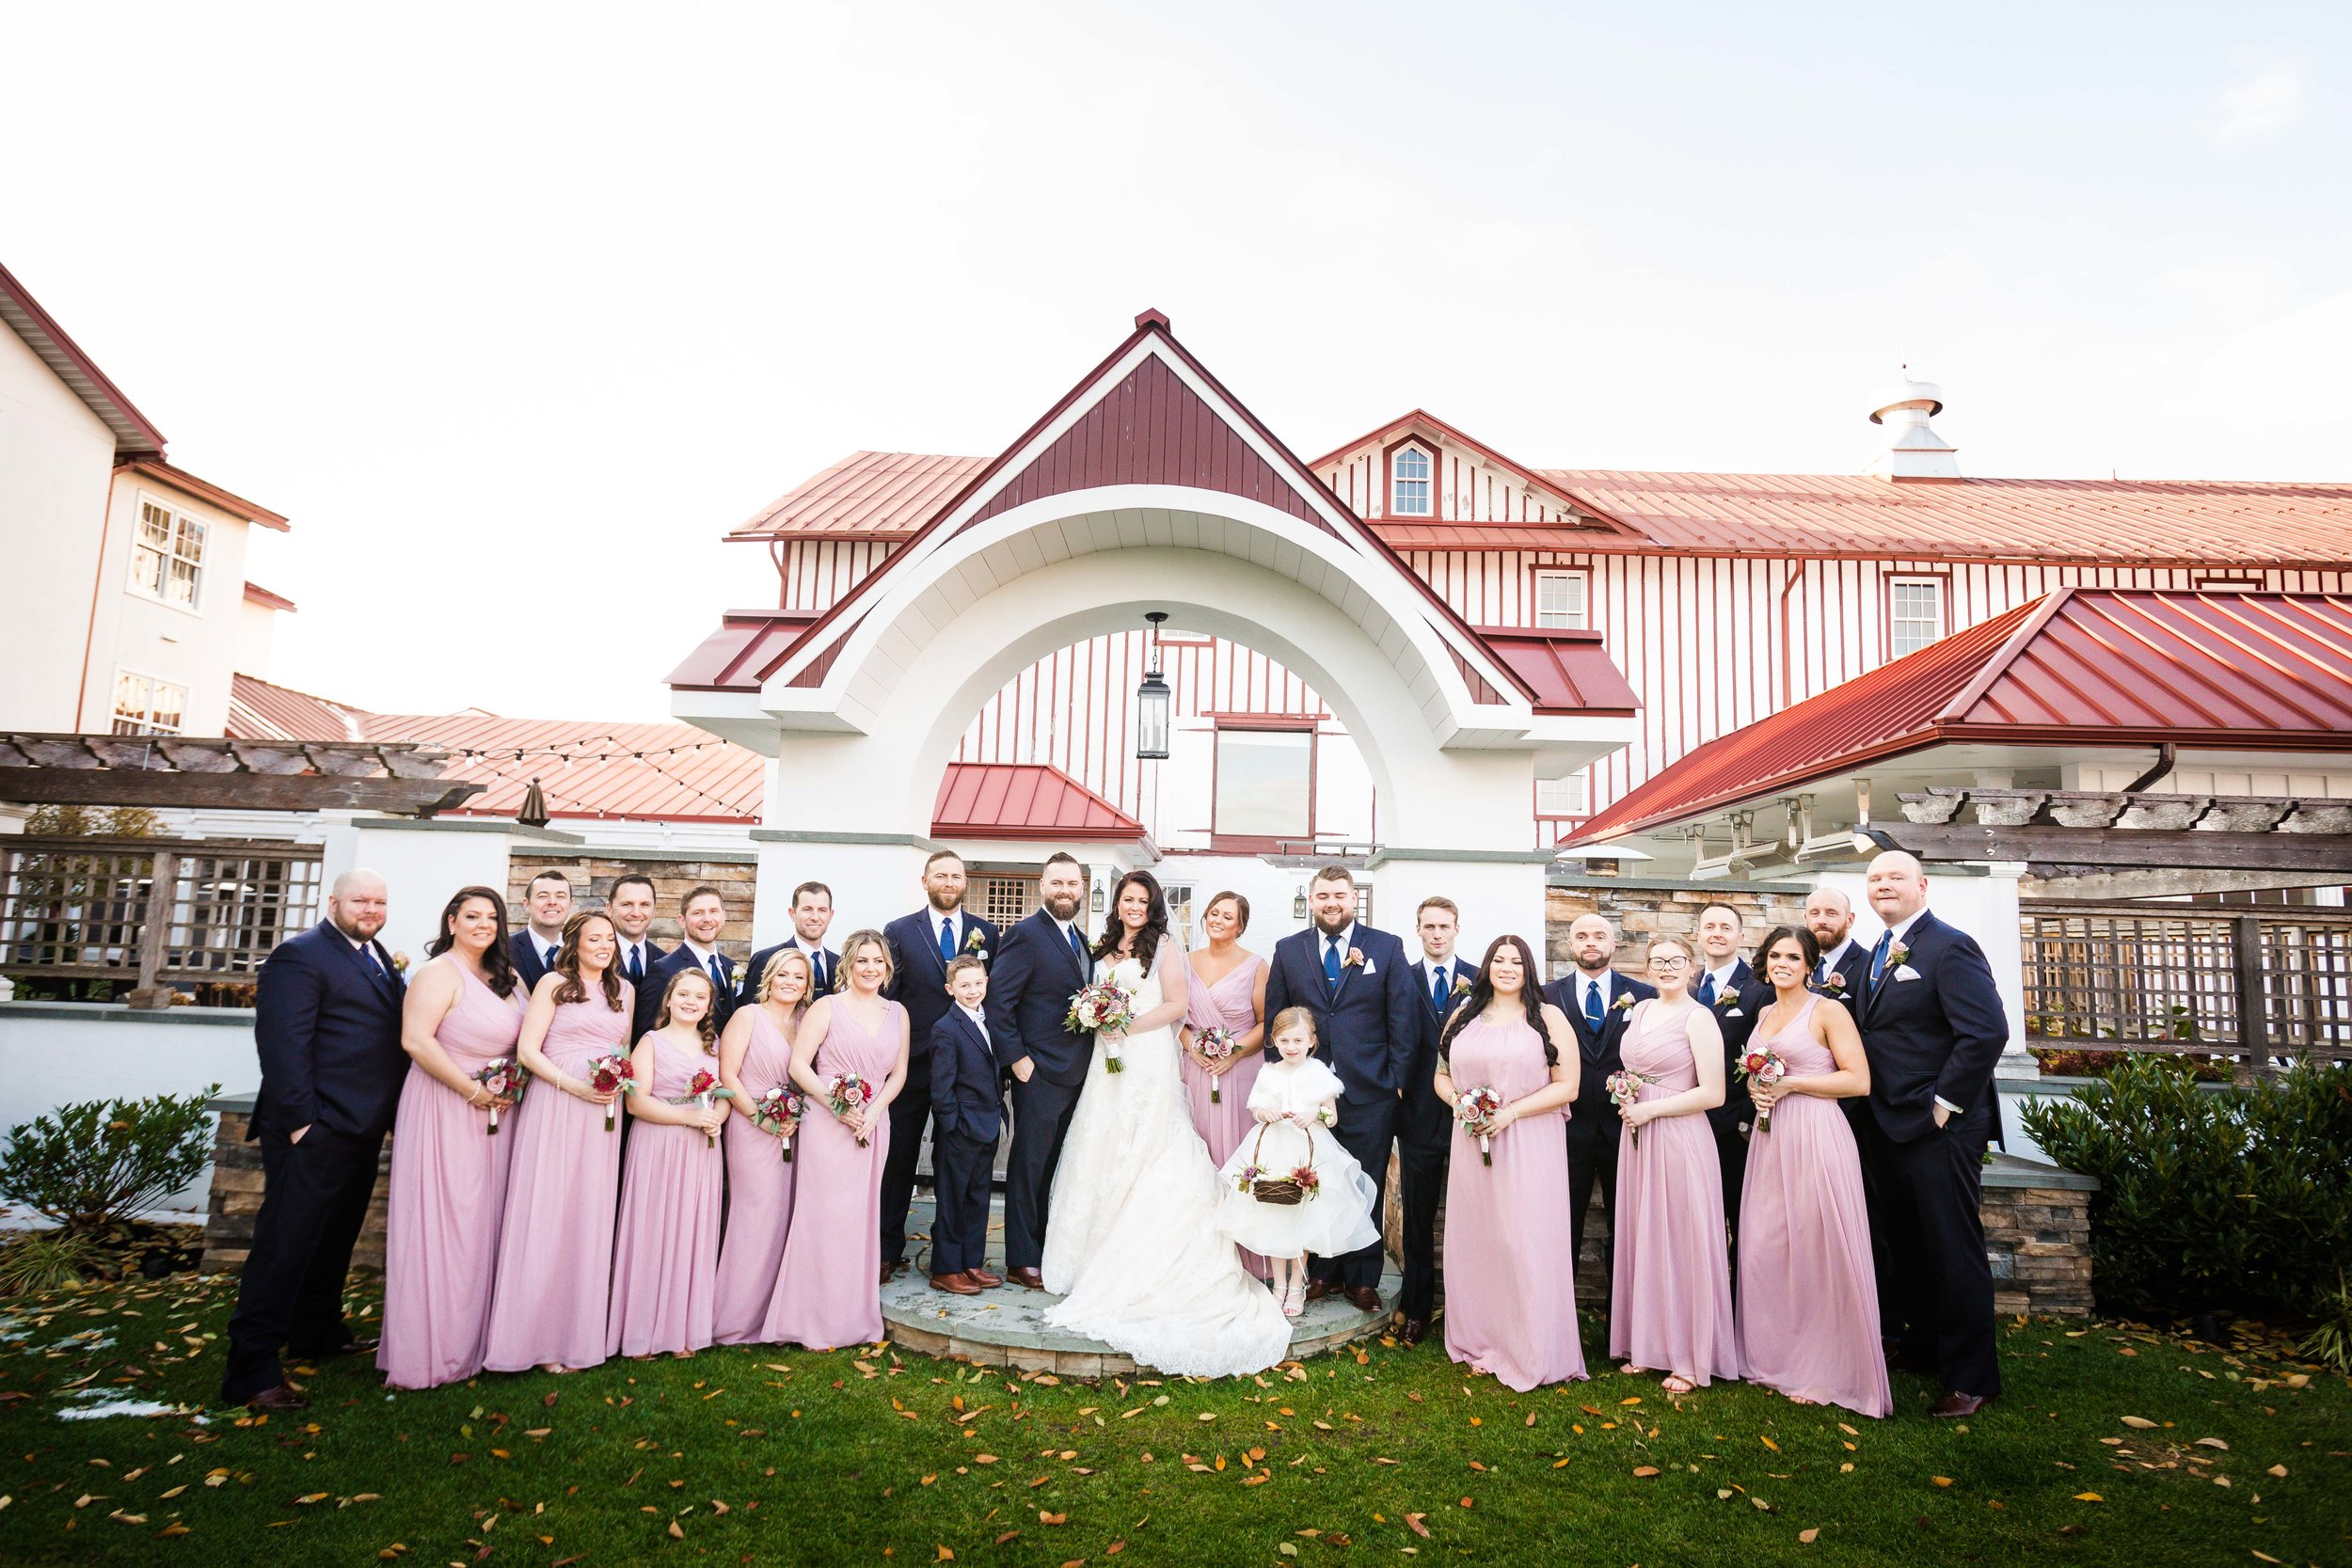 Diana and Henry - Normandy Farms Wedding Photography - Estras-62.jpg